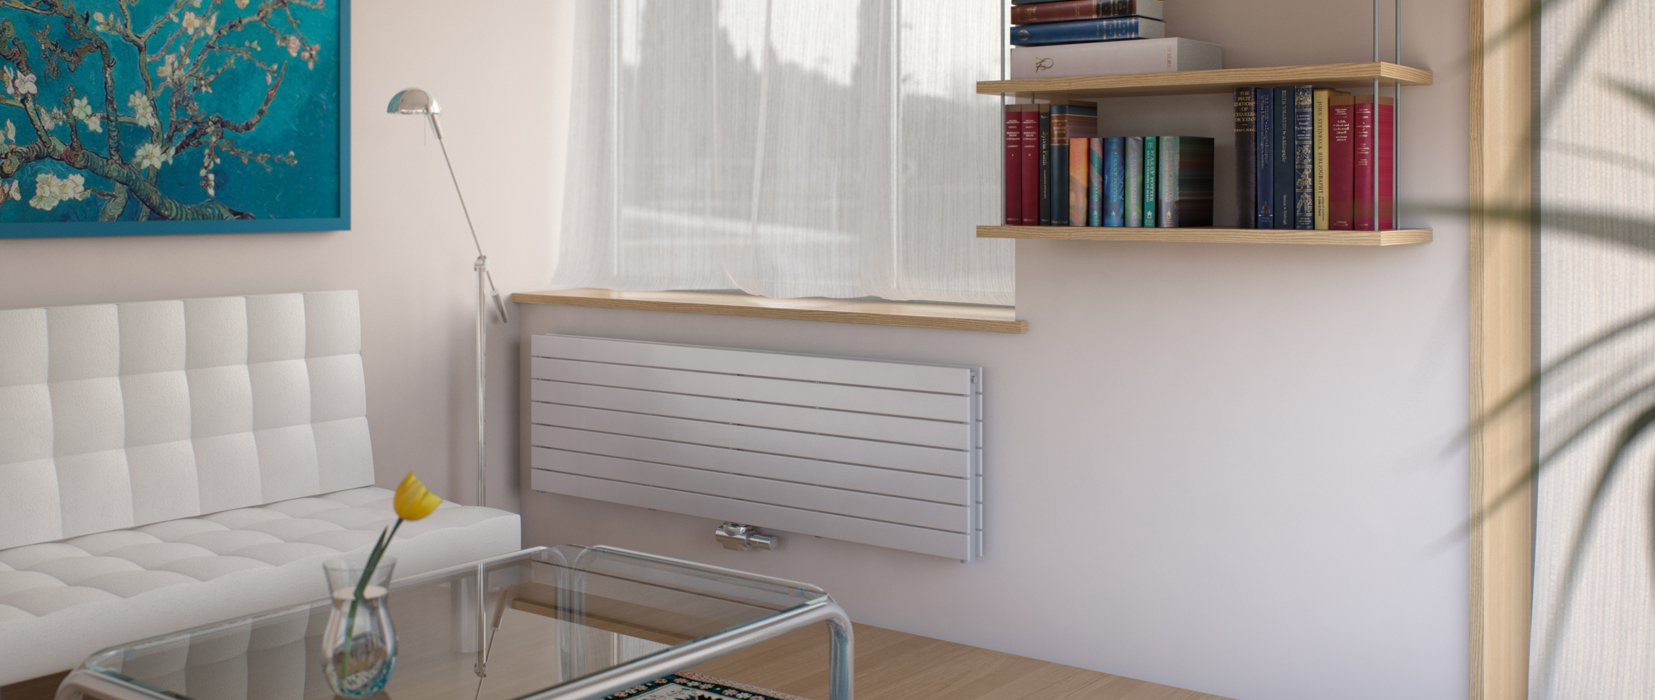 KORATHERM HORIZONTAL - M - Design radiators with horizontally ...